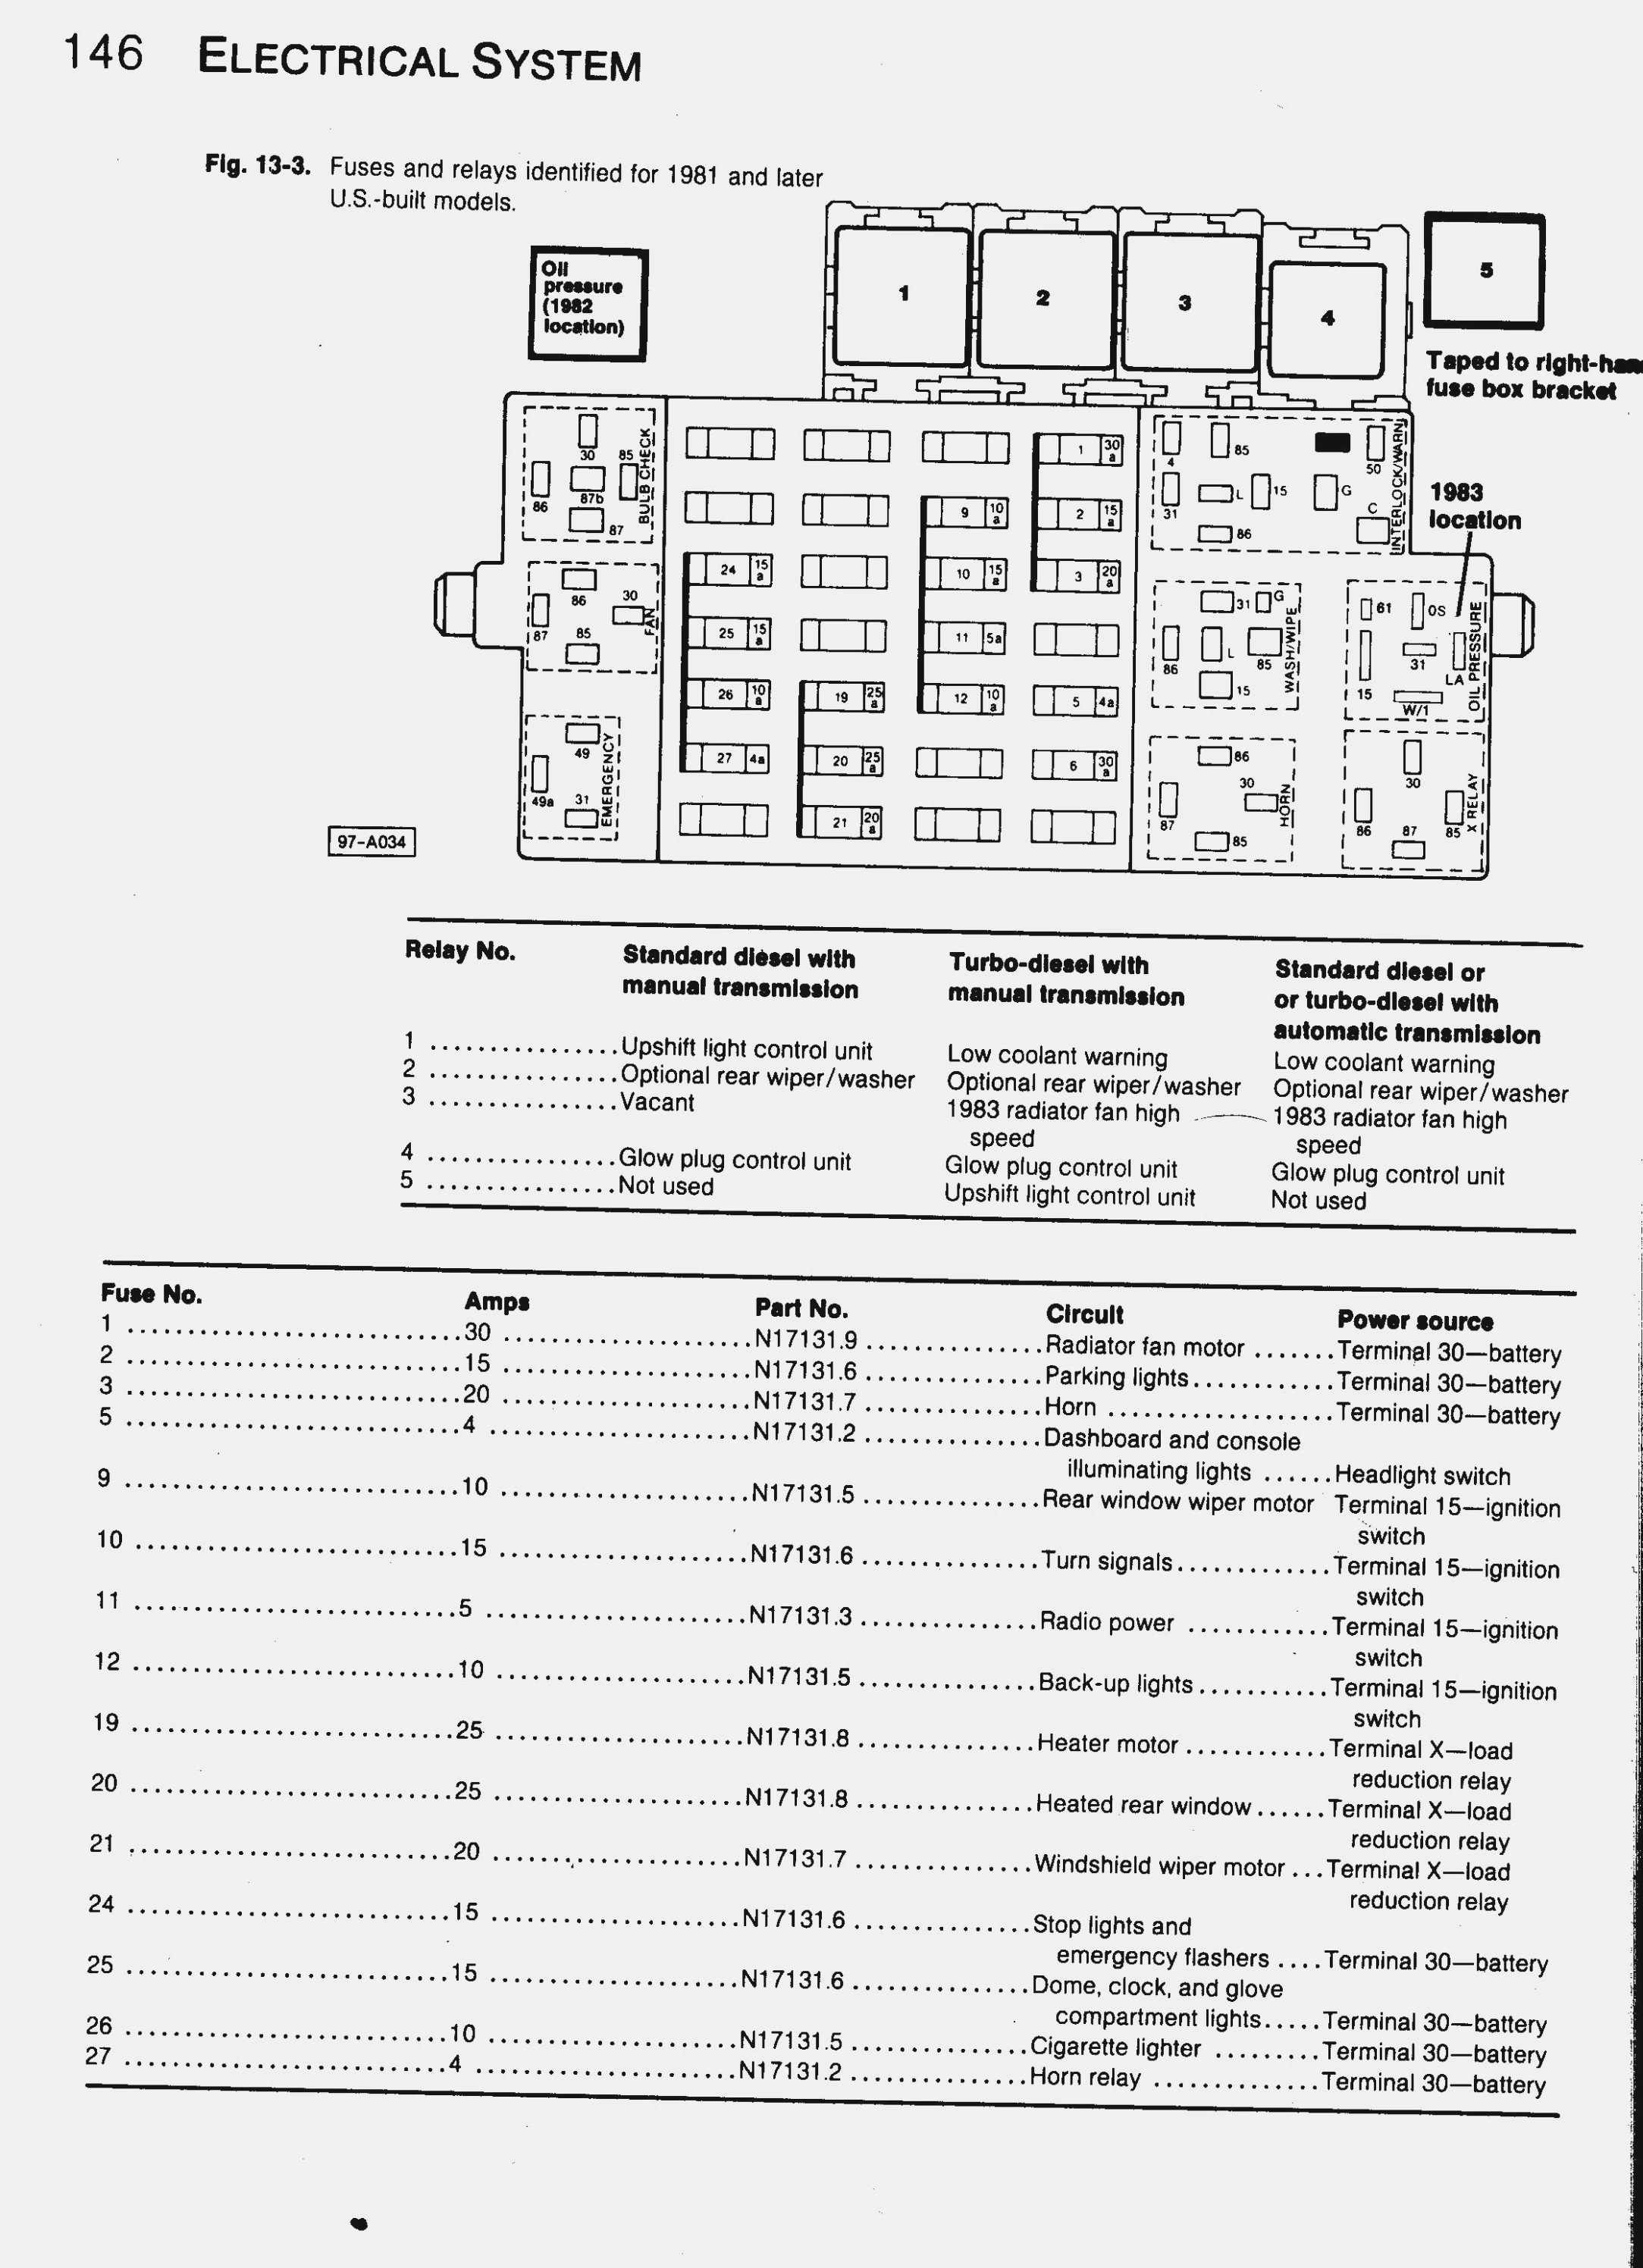 2001 International 9100i Fuse Box Diagram International Fuse Box Wiring Diagram Wiring Diagram Of 2001 International 9100i Fuse Box Diagram